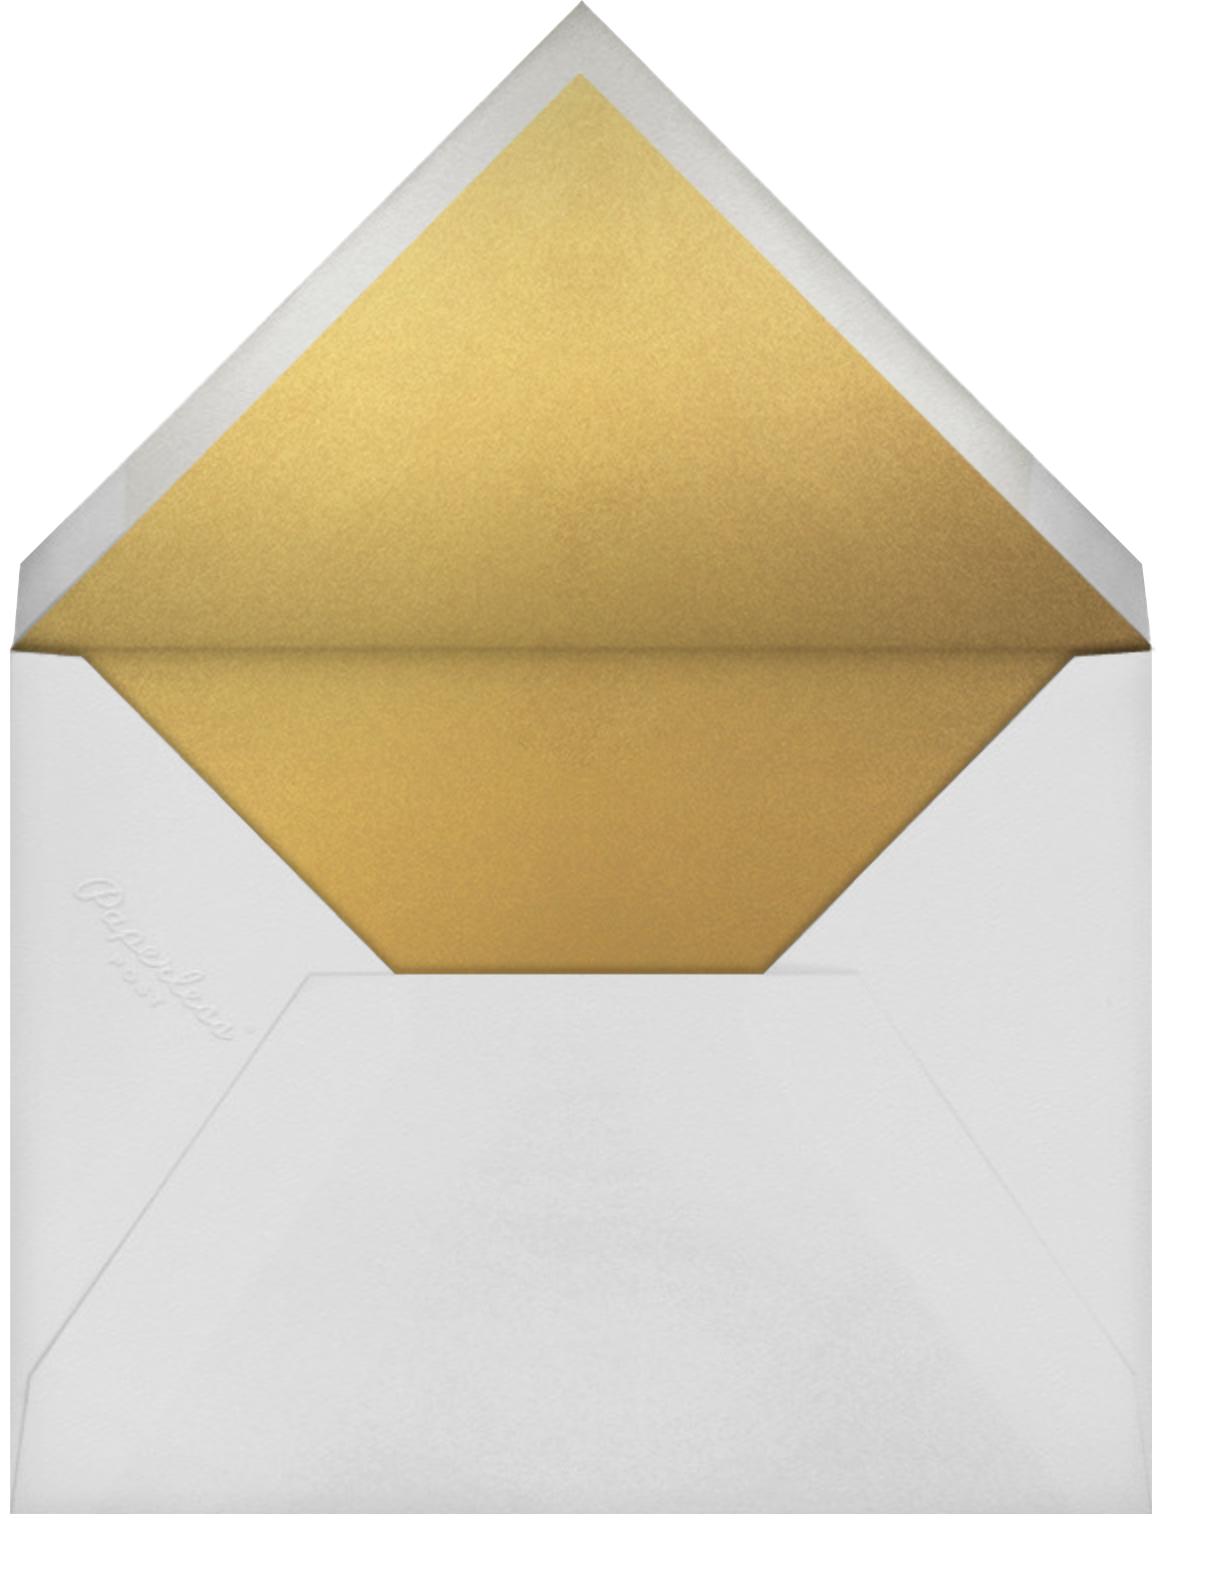 Mast (Stationery) - Amethyst  - Vera Wang - Personalized stationery - envelope back